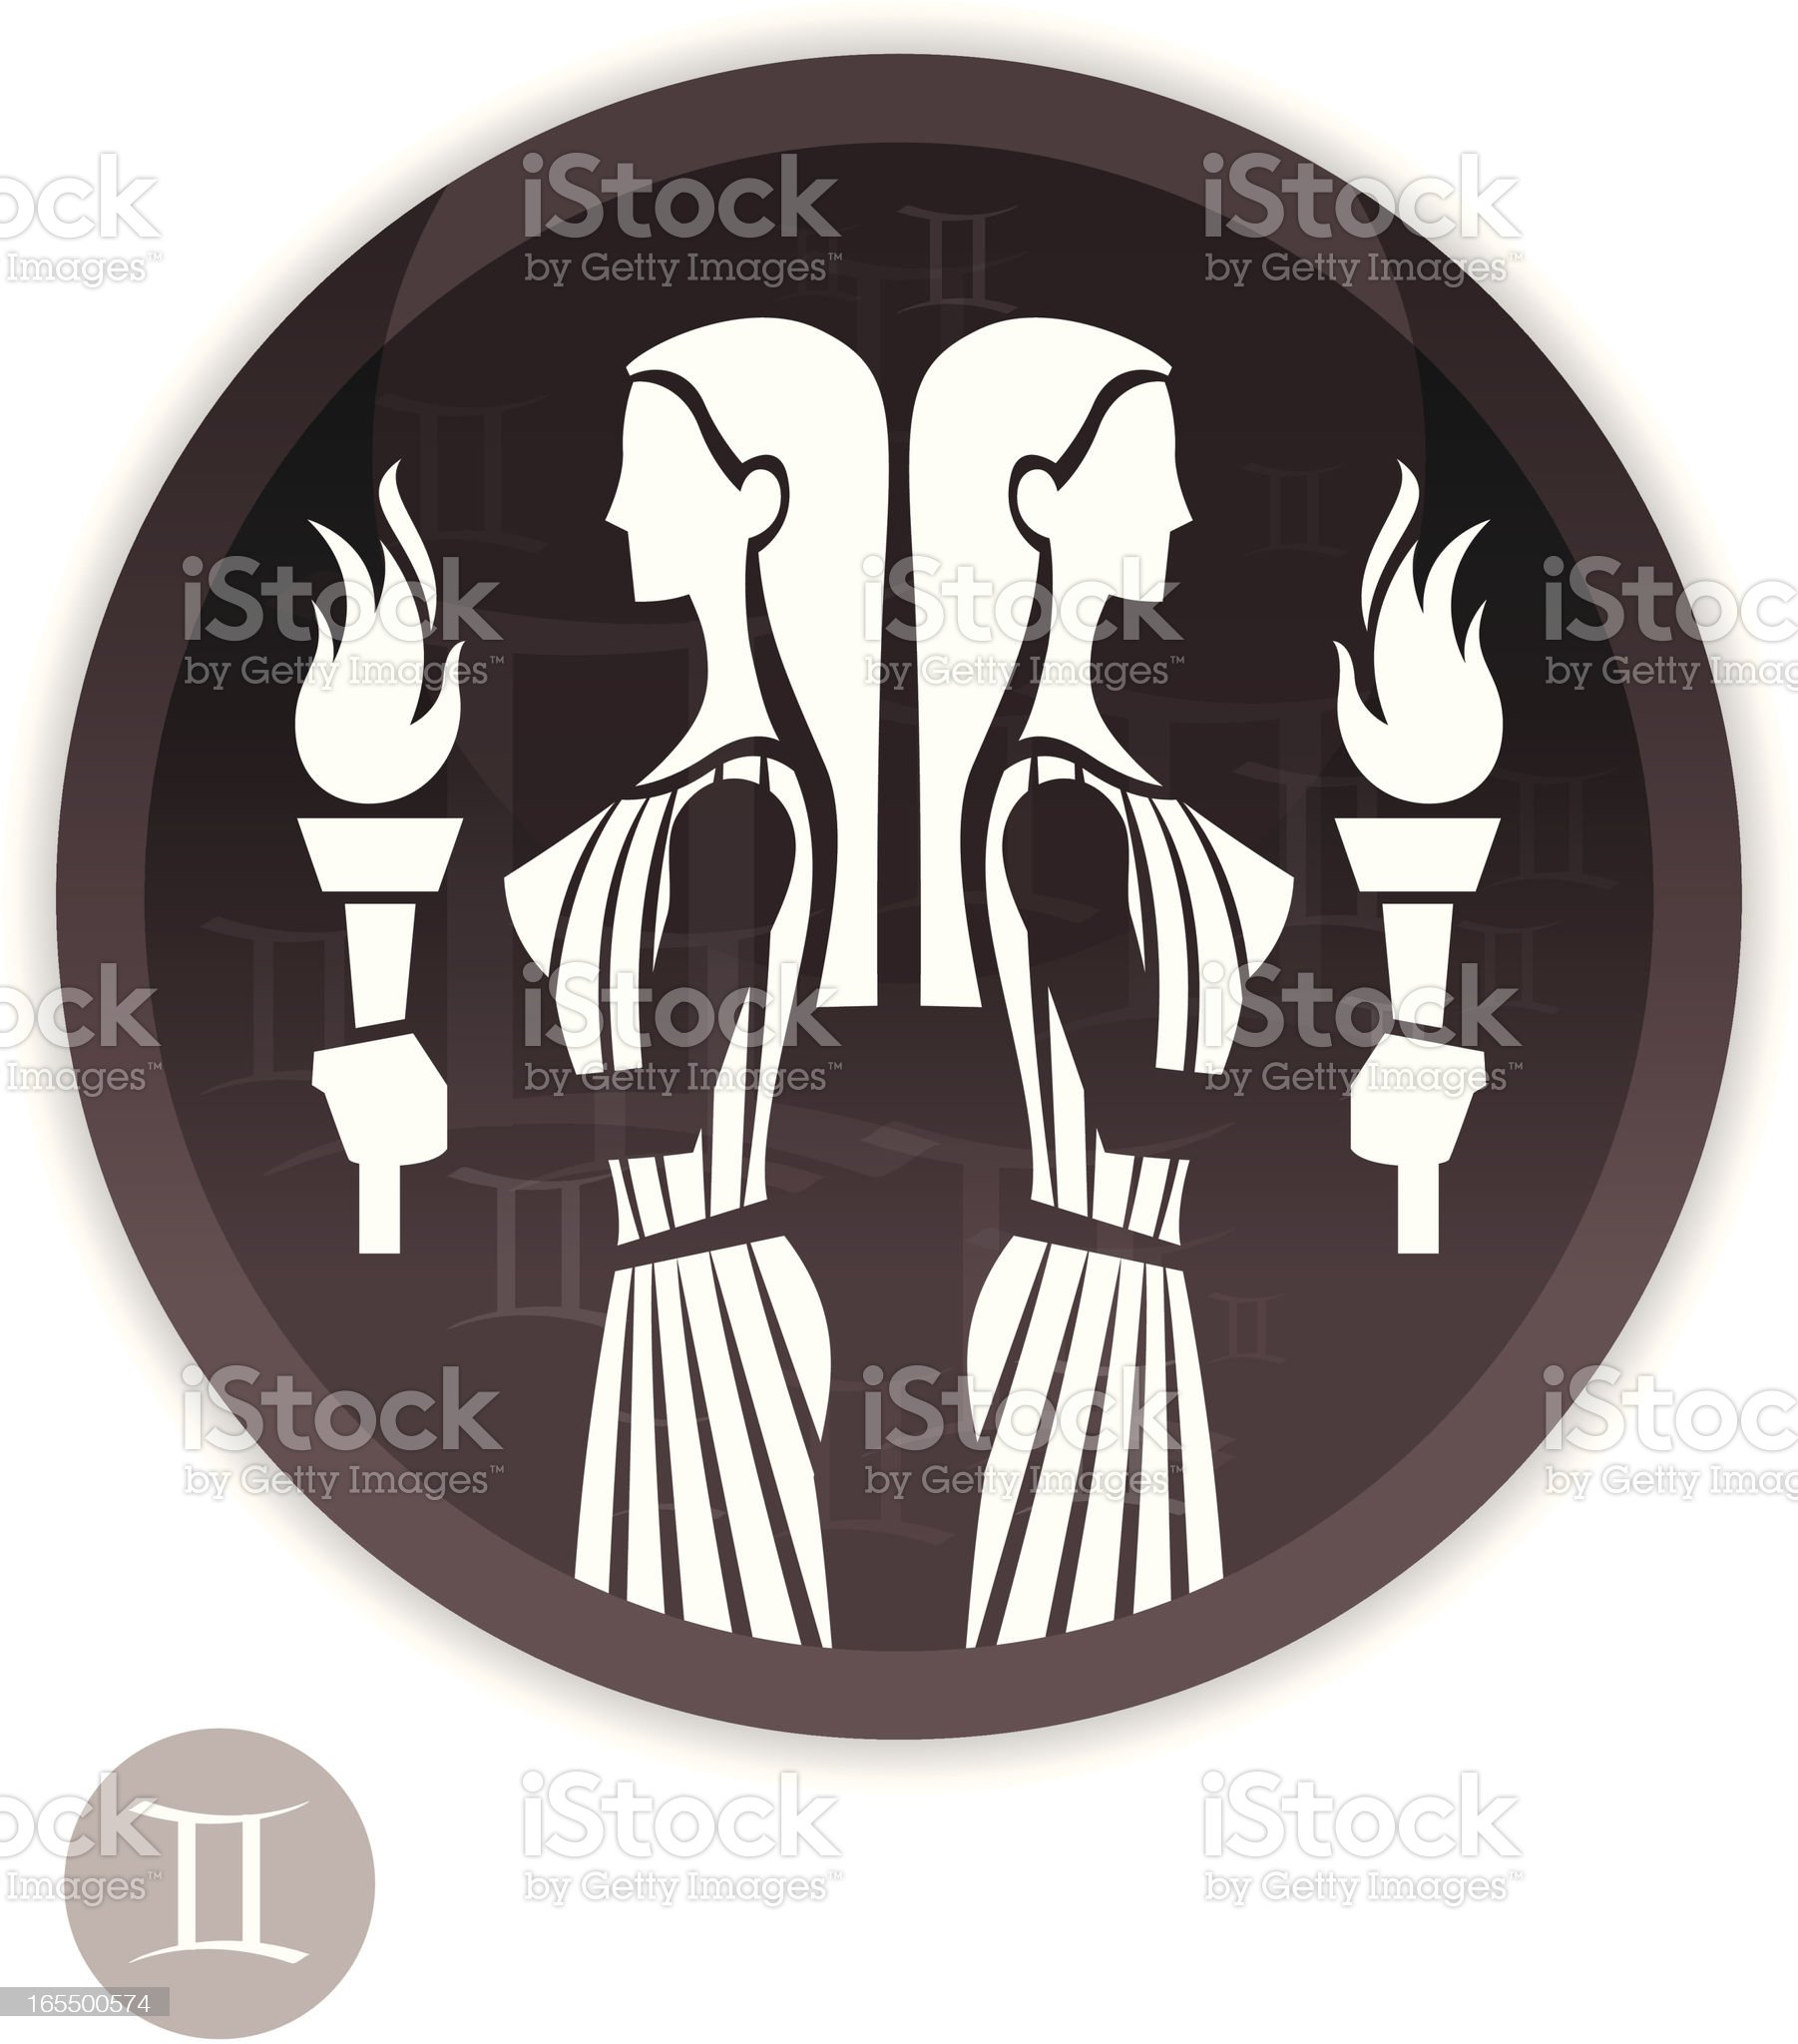 Female Zodiac - Gemini royalty-free stock vector art